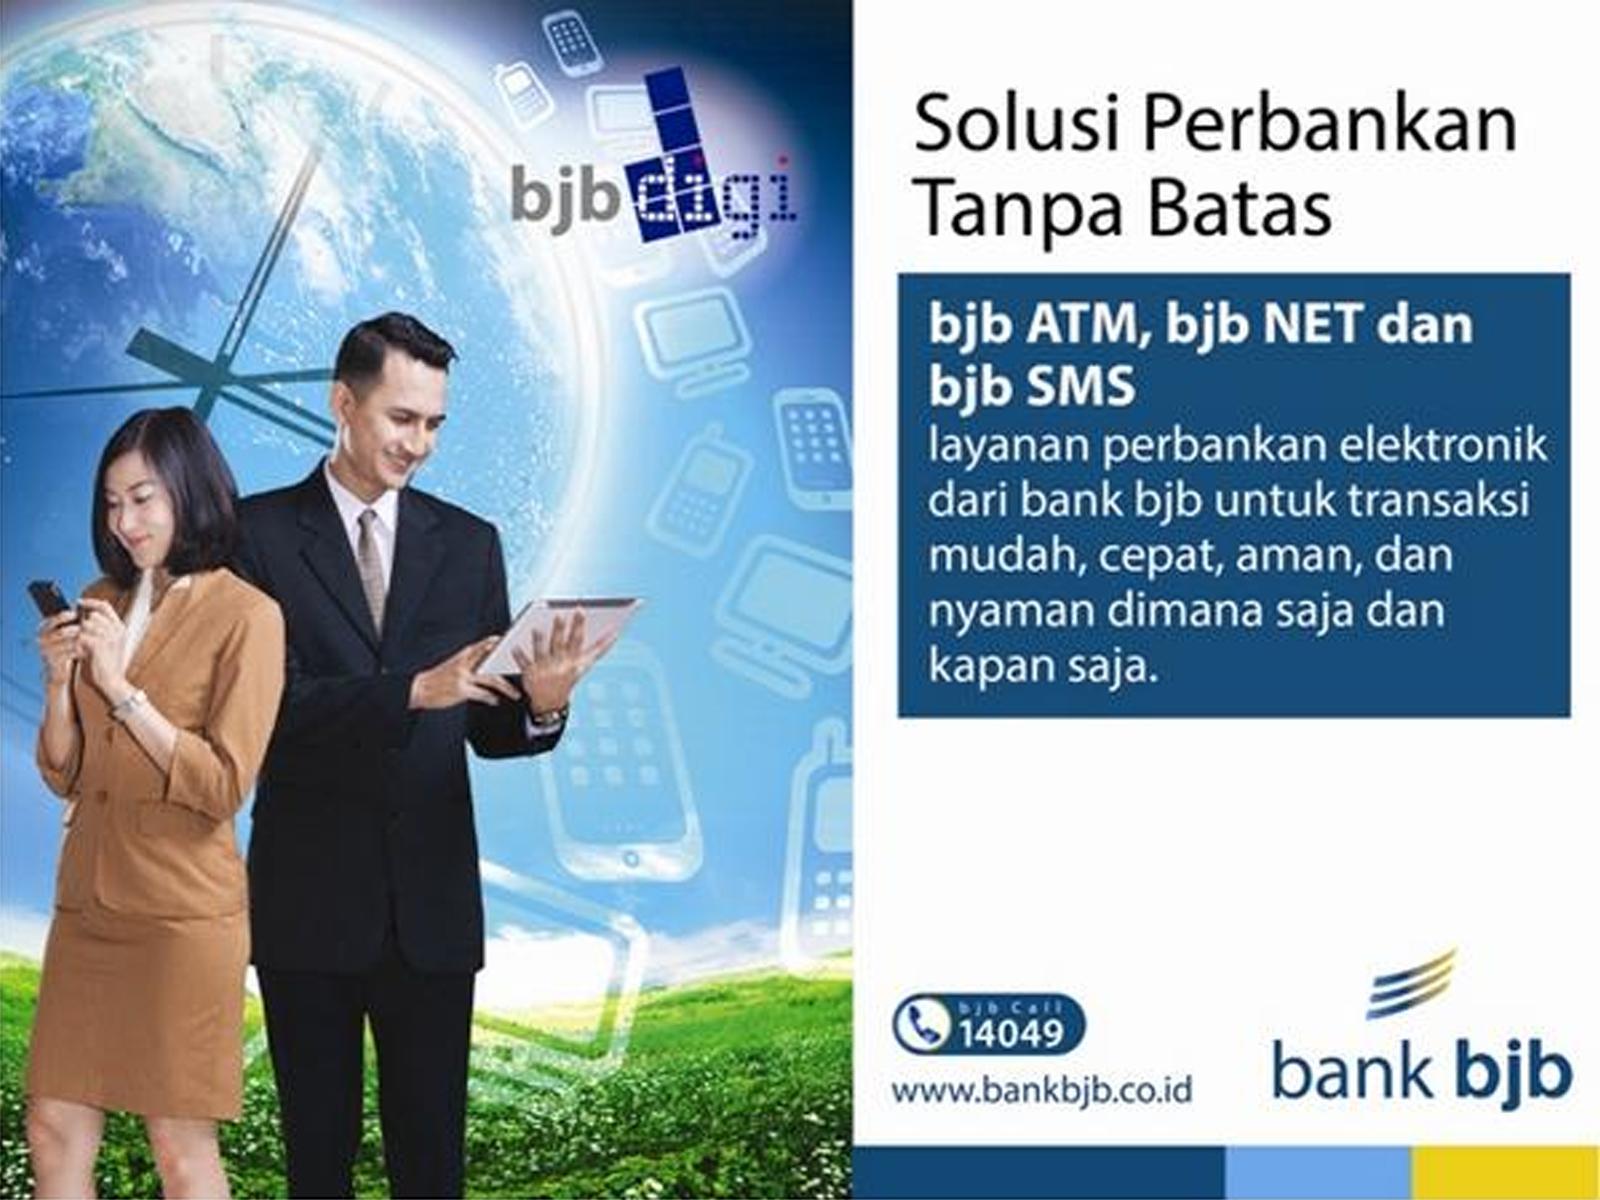 49+ Cara Sms Banking Bjb Terbaru